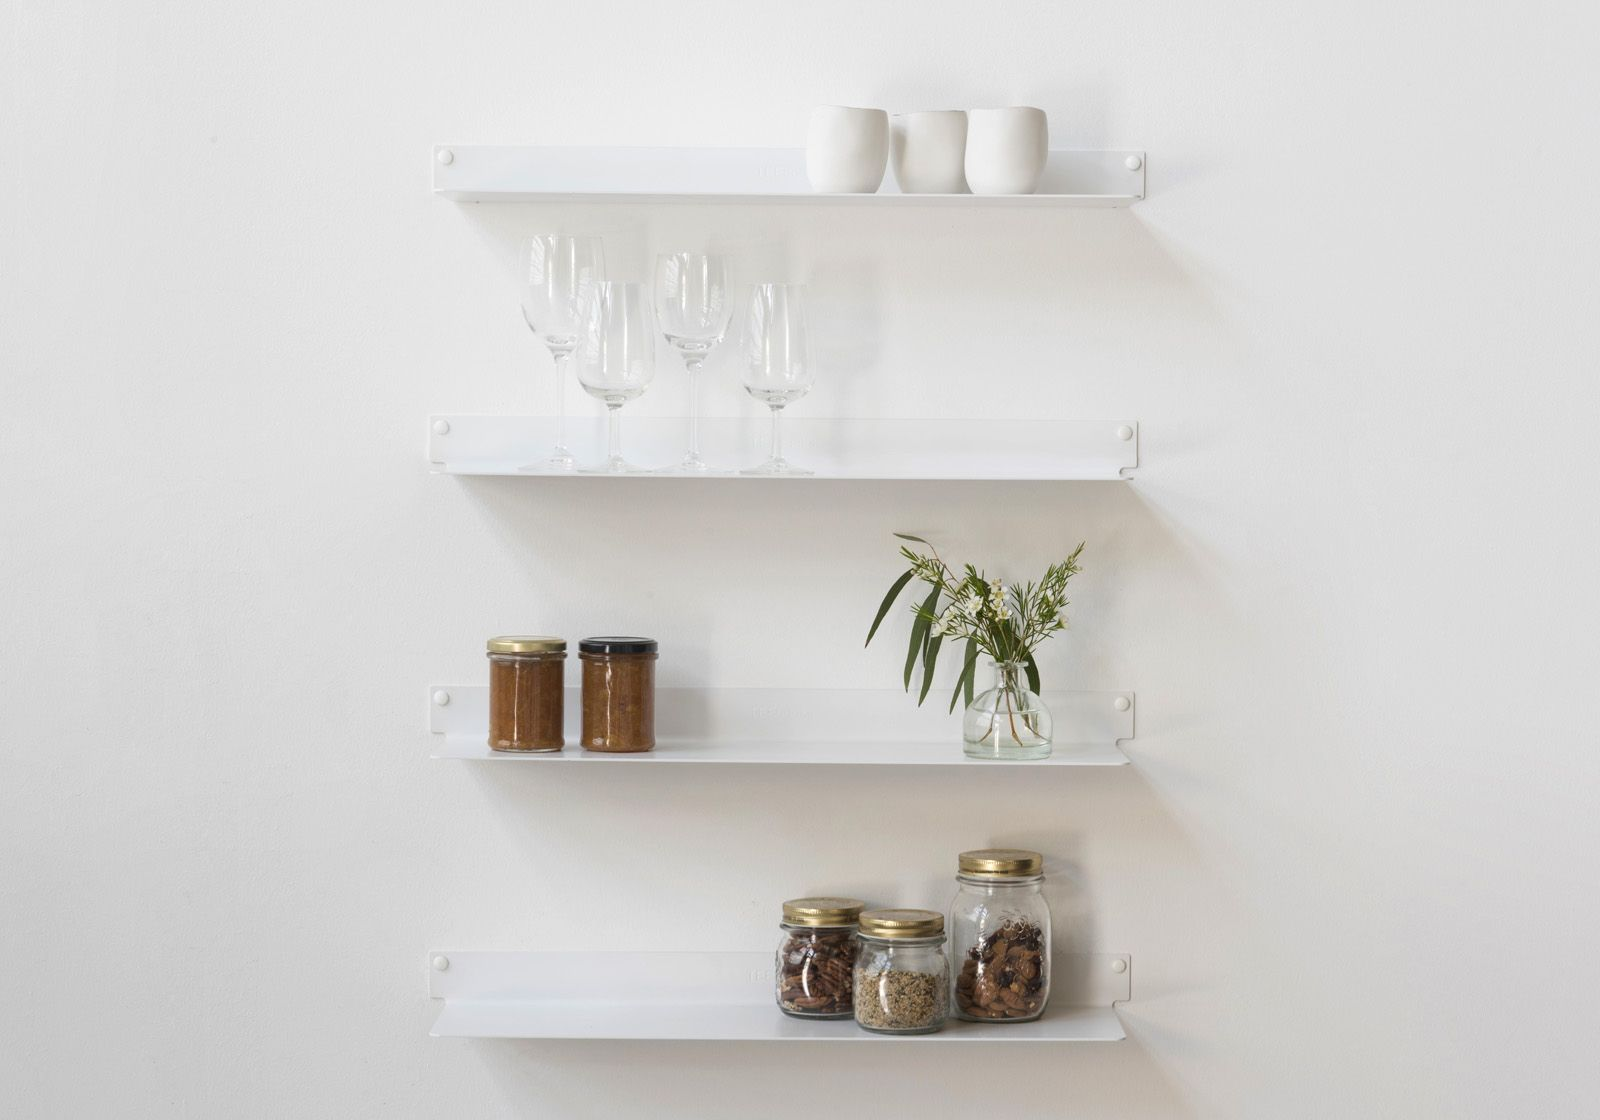 Kitchen shelves teeline 4515 set of 4 teebooks - Estantes de cocina ...